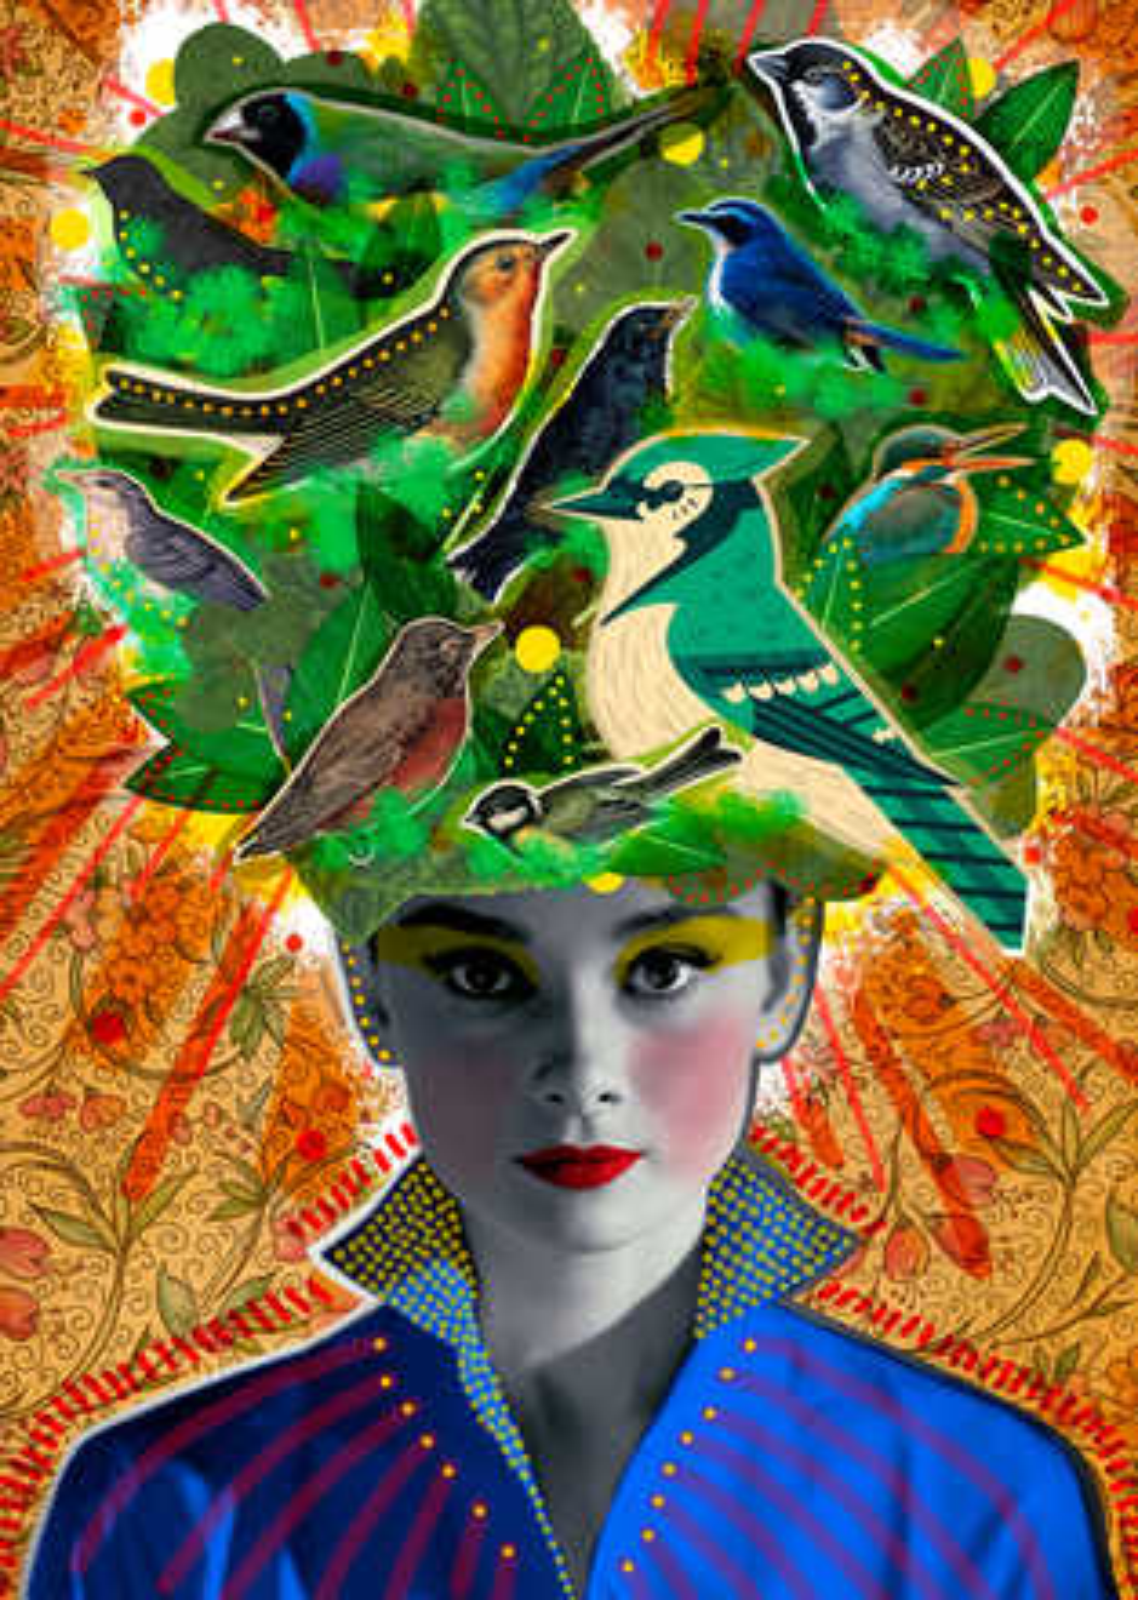 Your Head is Full of Birdies - Peperina Magenta